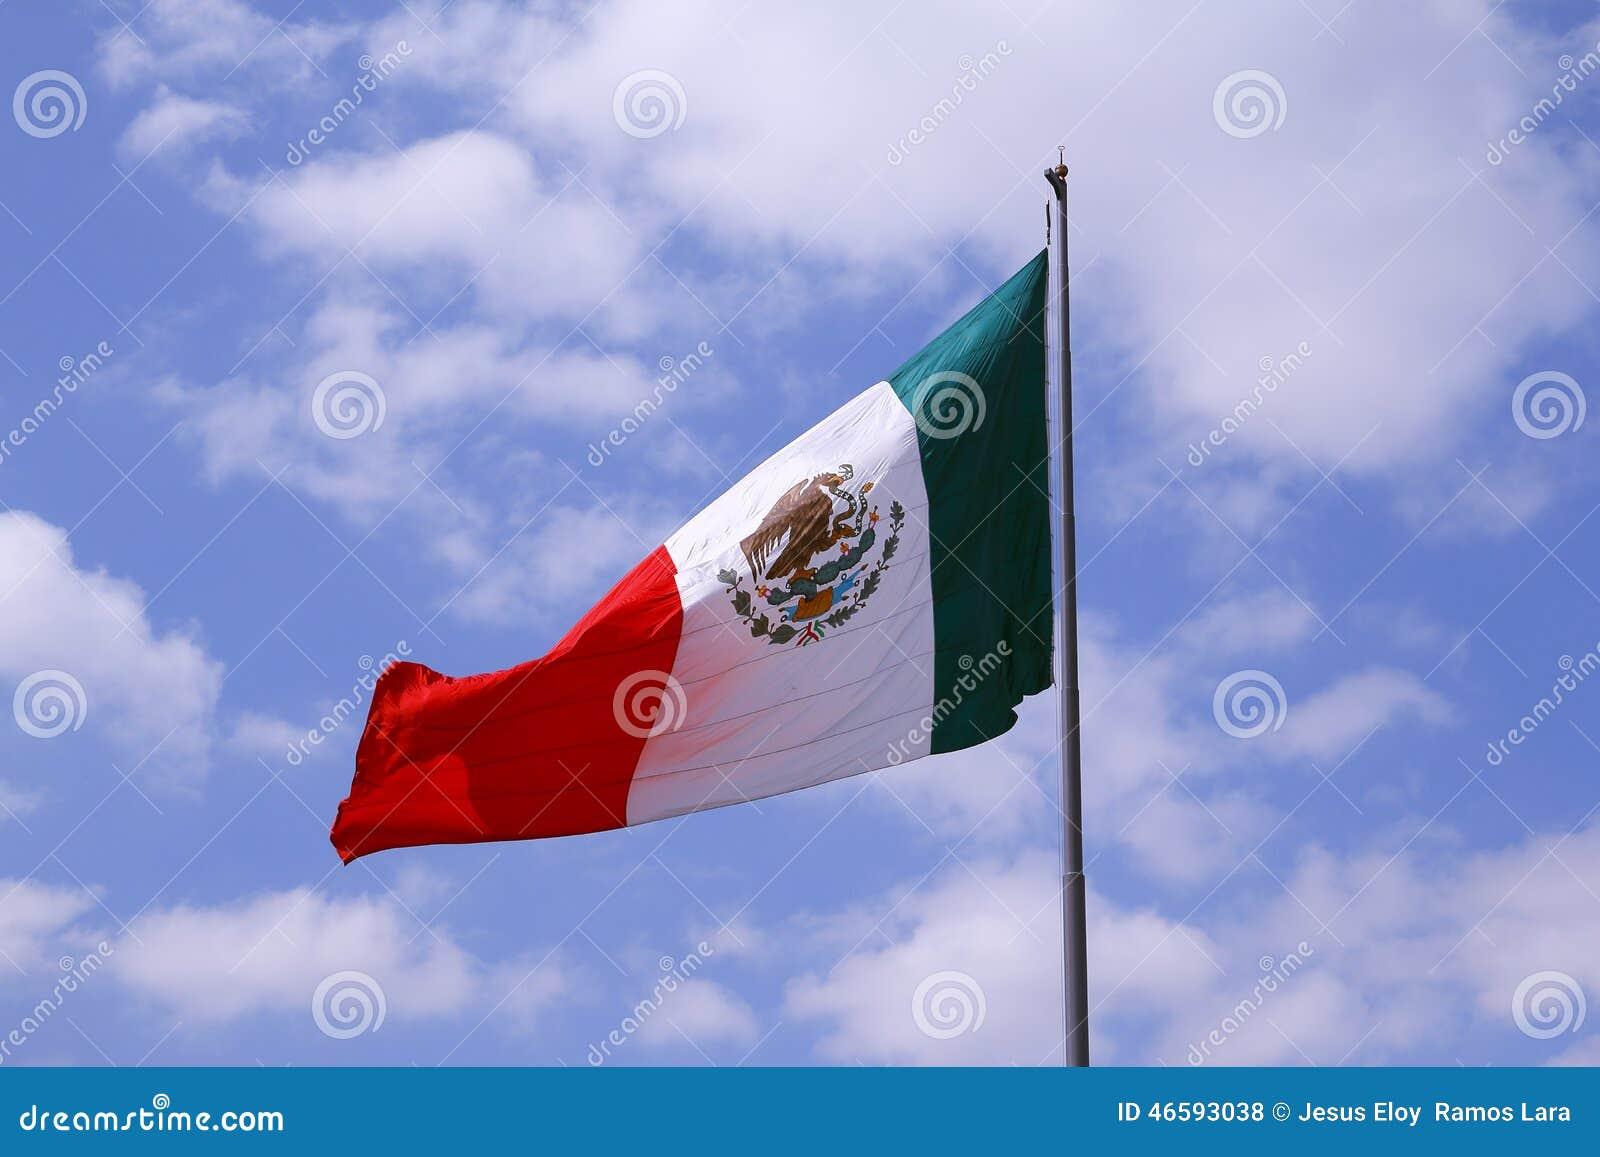 Mexican flag I